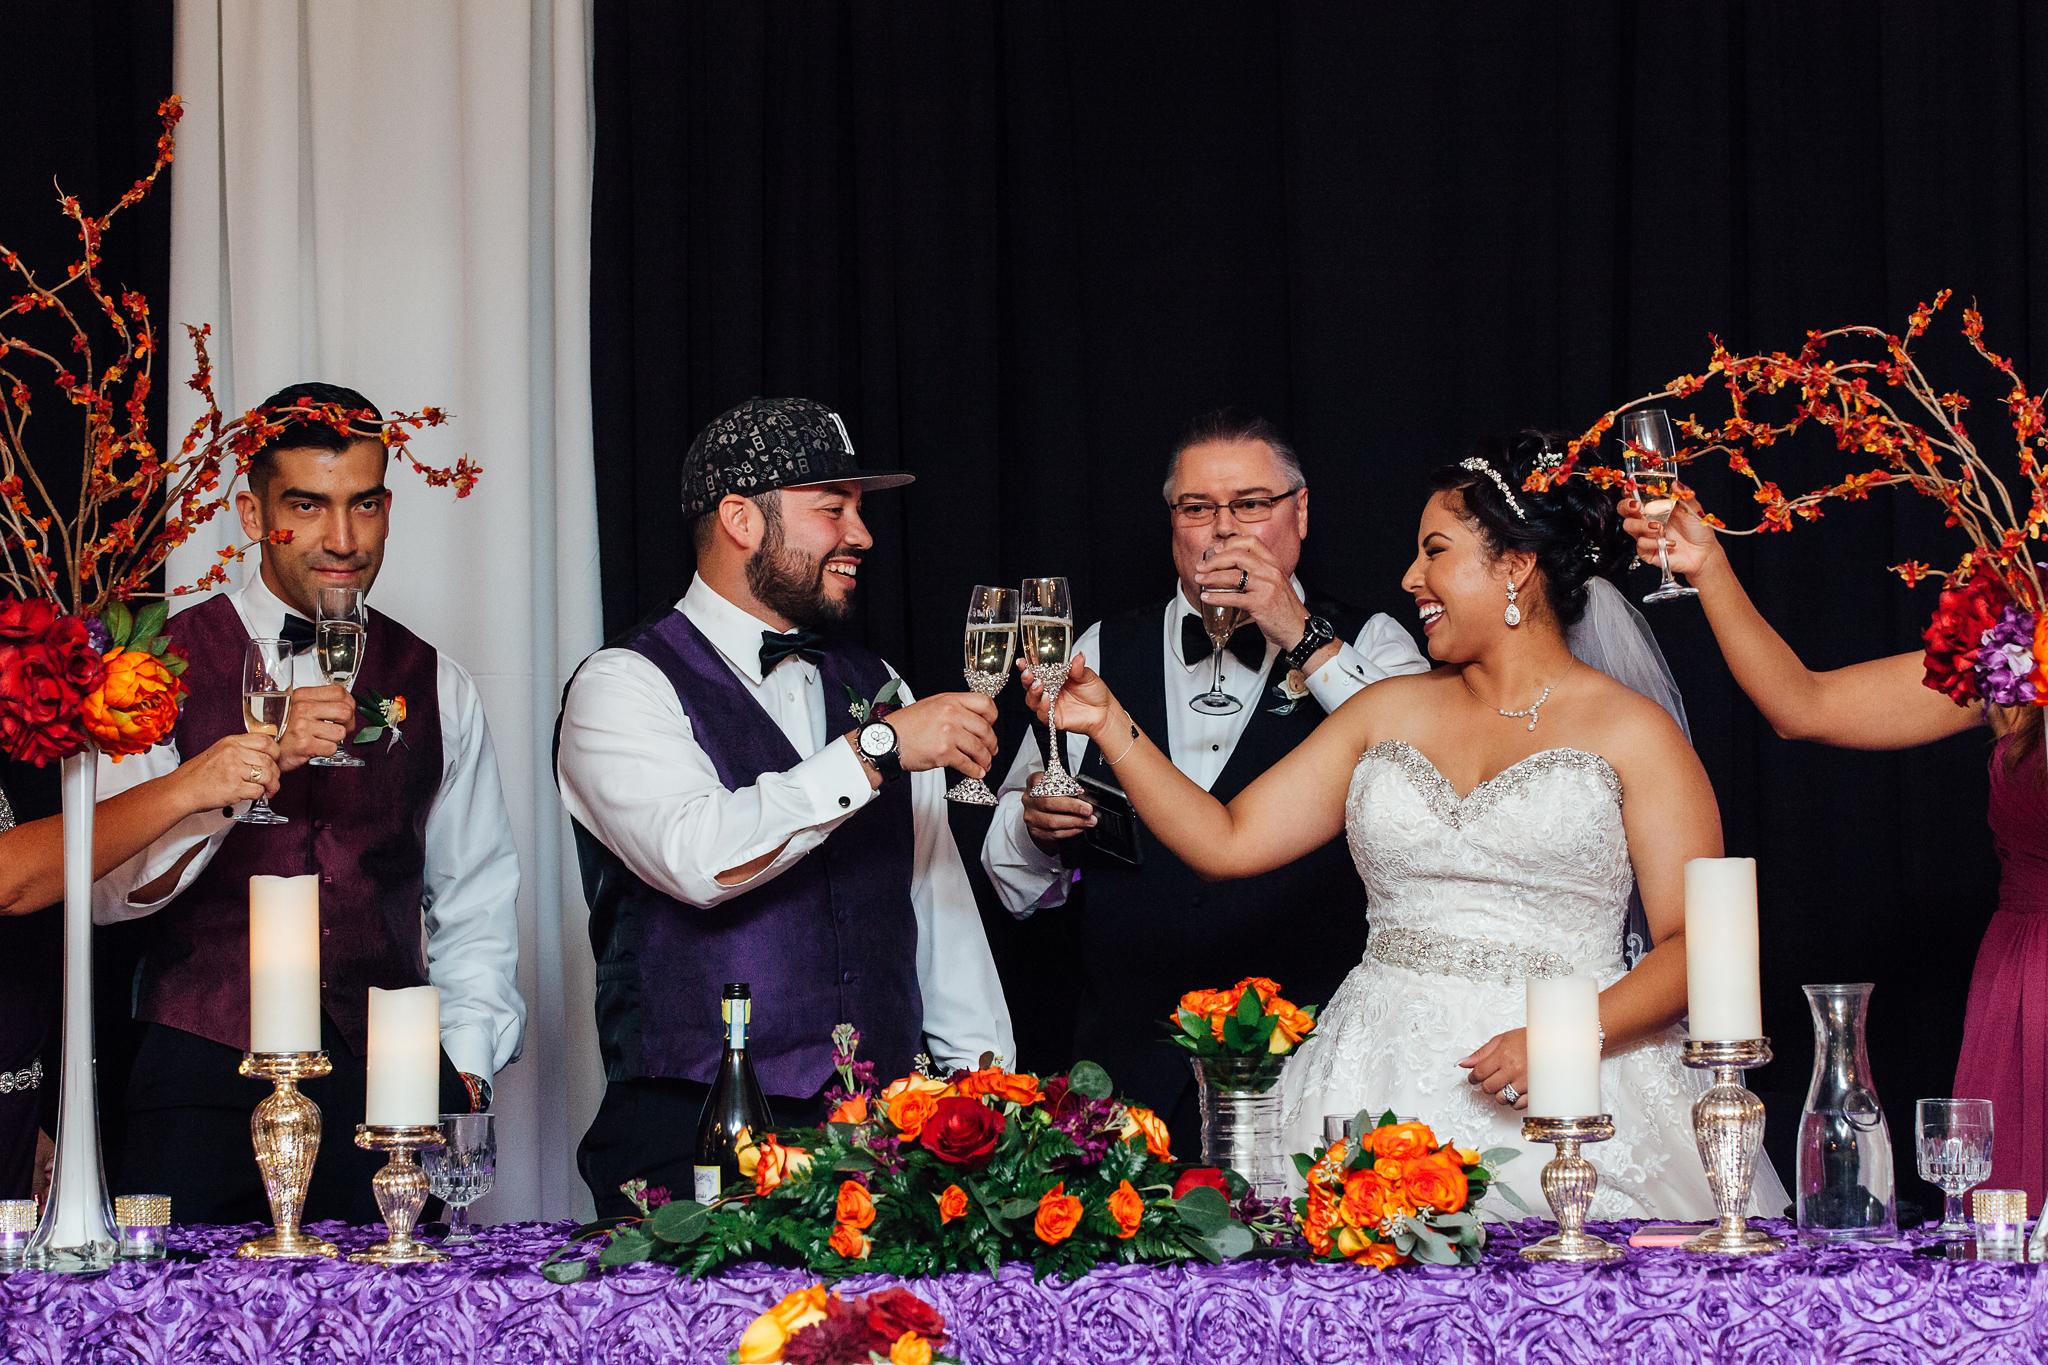 wedding-photographers-in-new-mexico-01.jpg